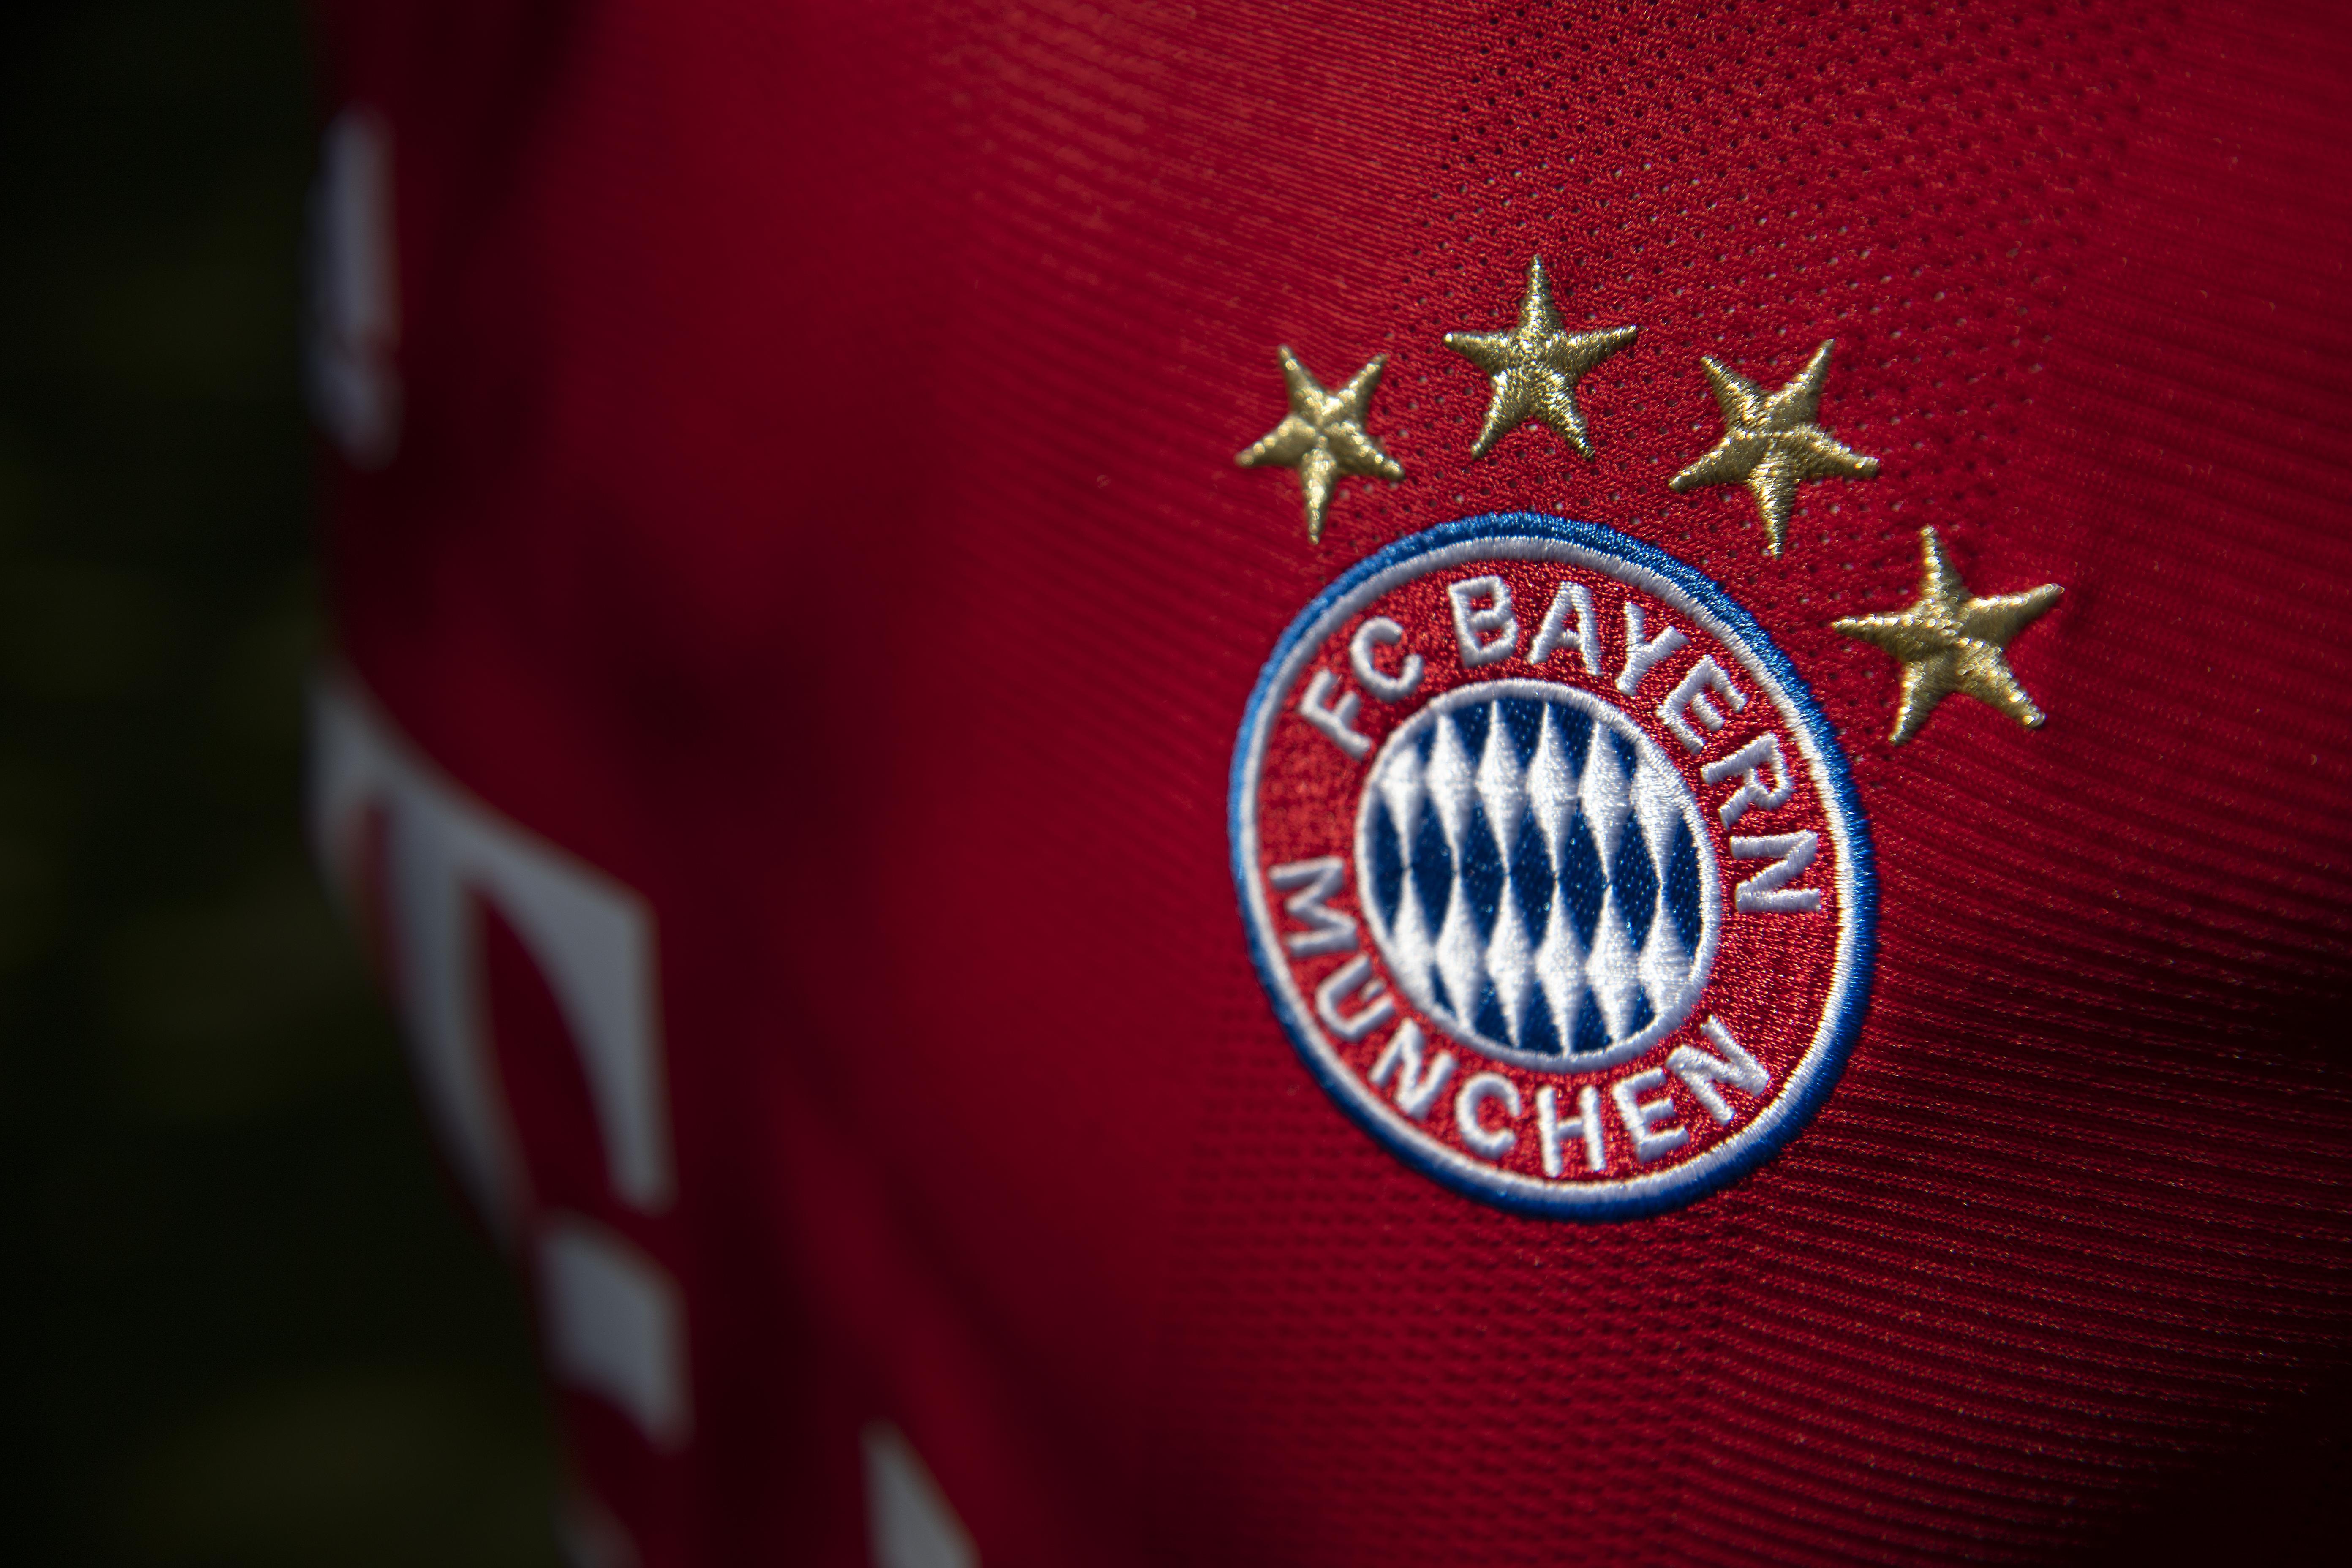 The FC Bayern Munich Home Shirt